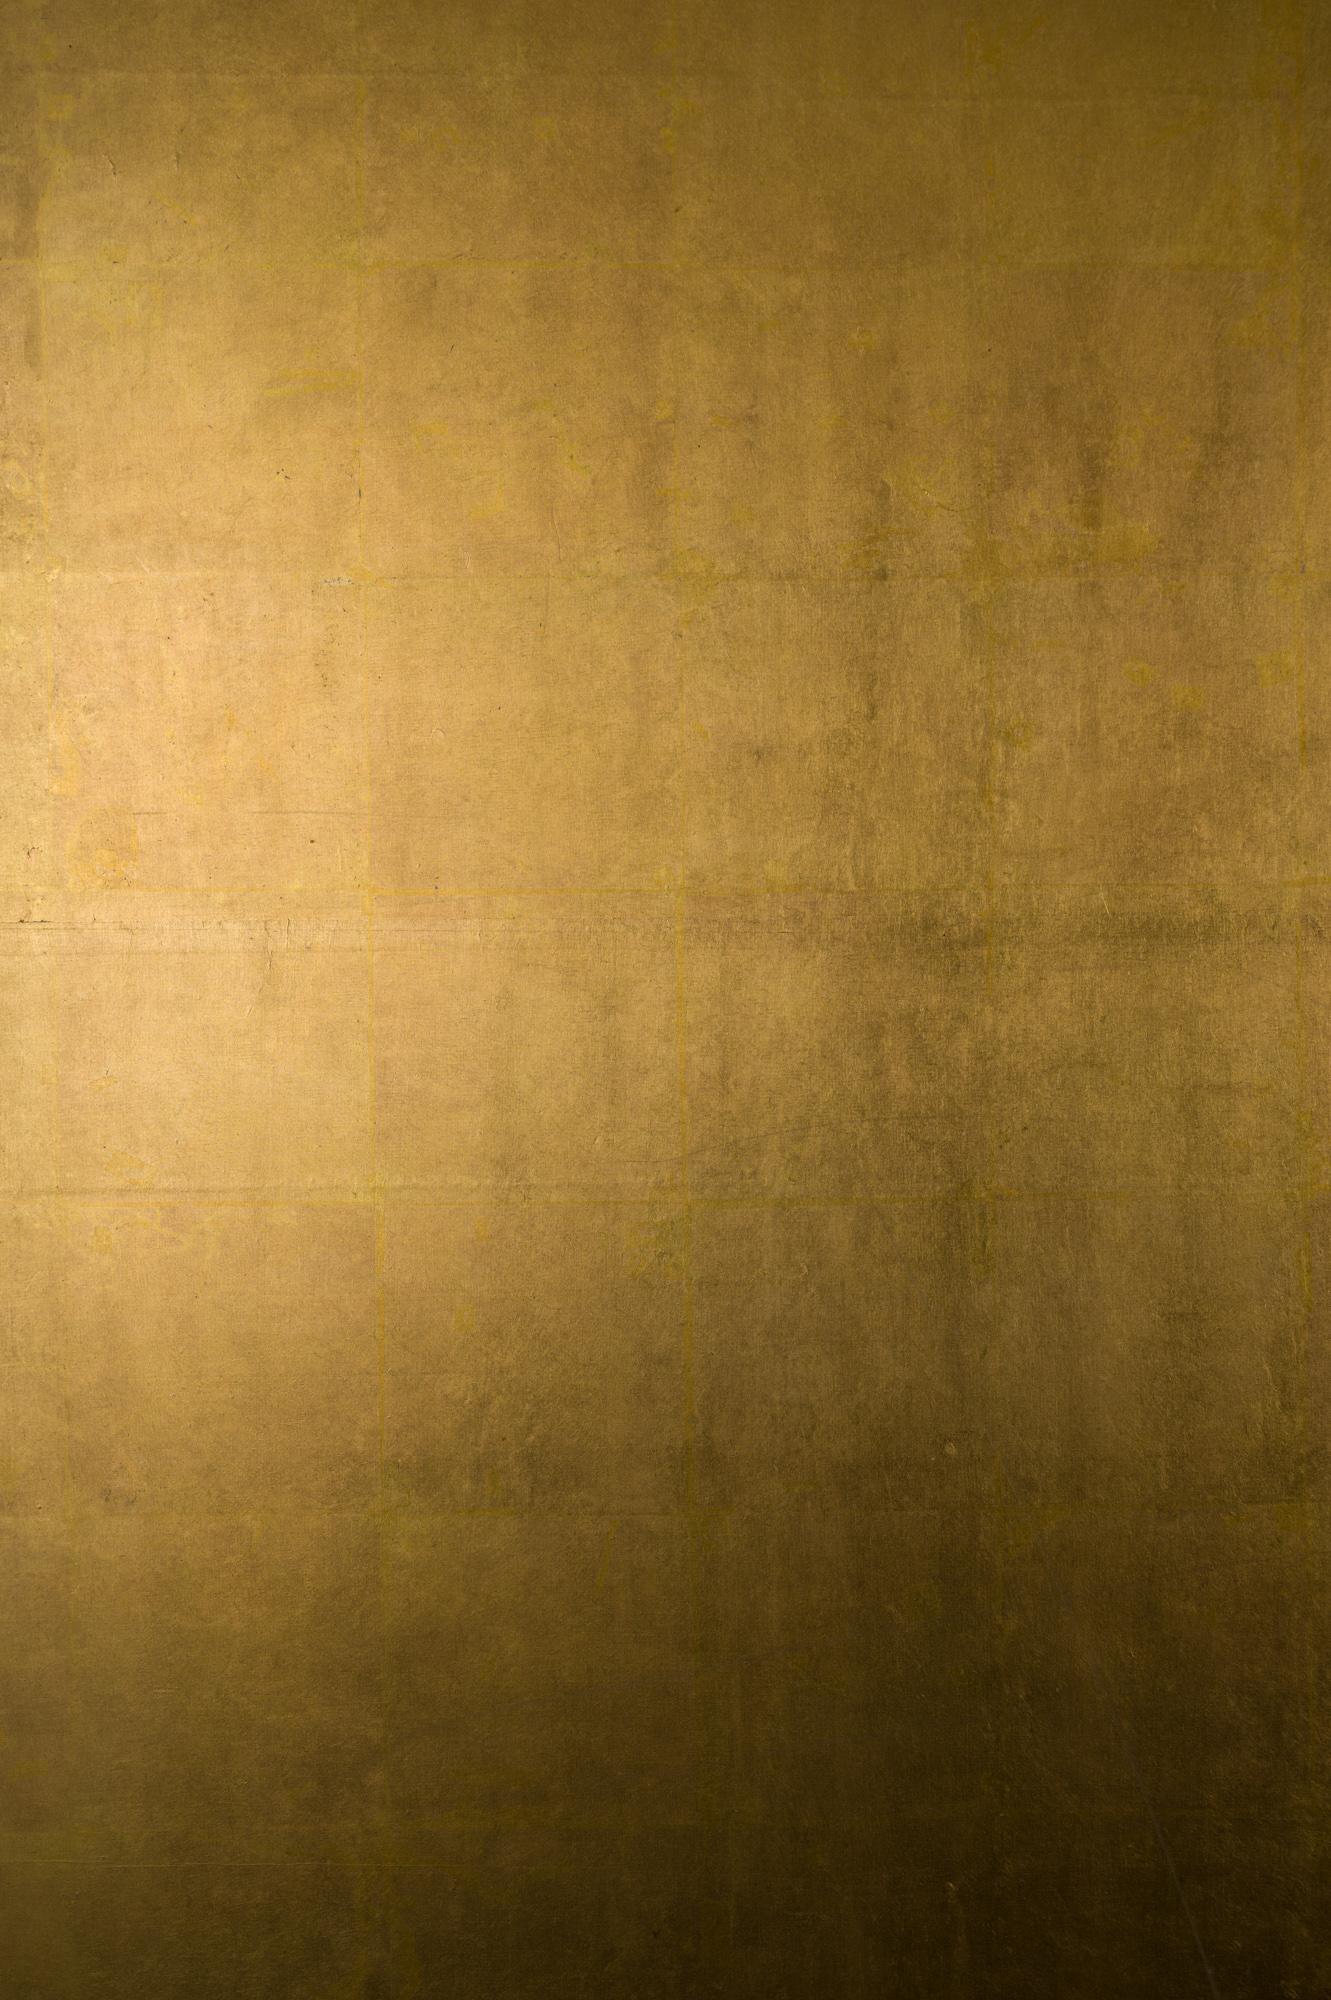 Japanese Six Panel Screen: Plain Gold Leaf (no image)